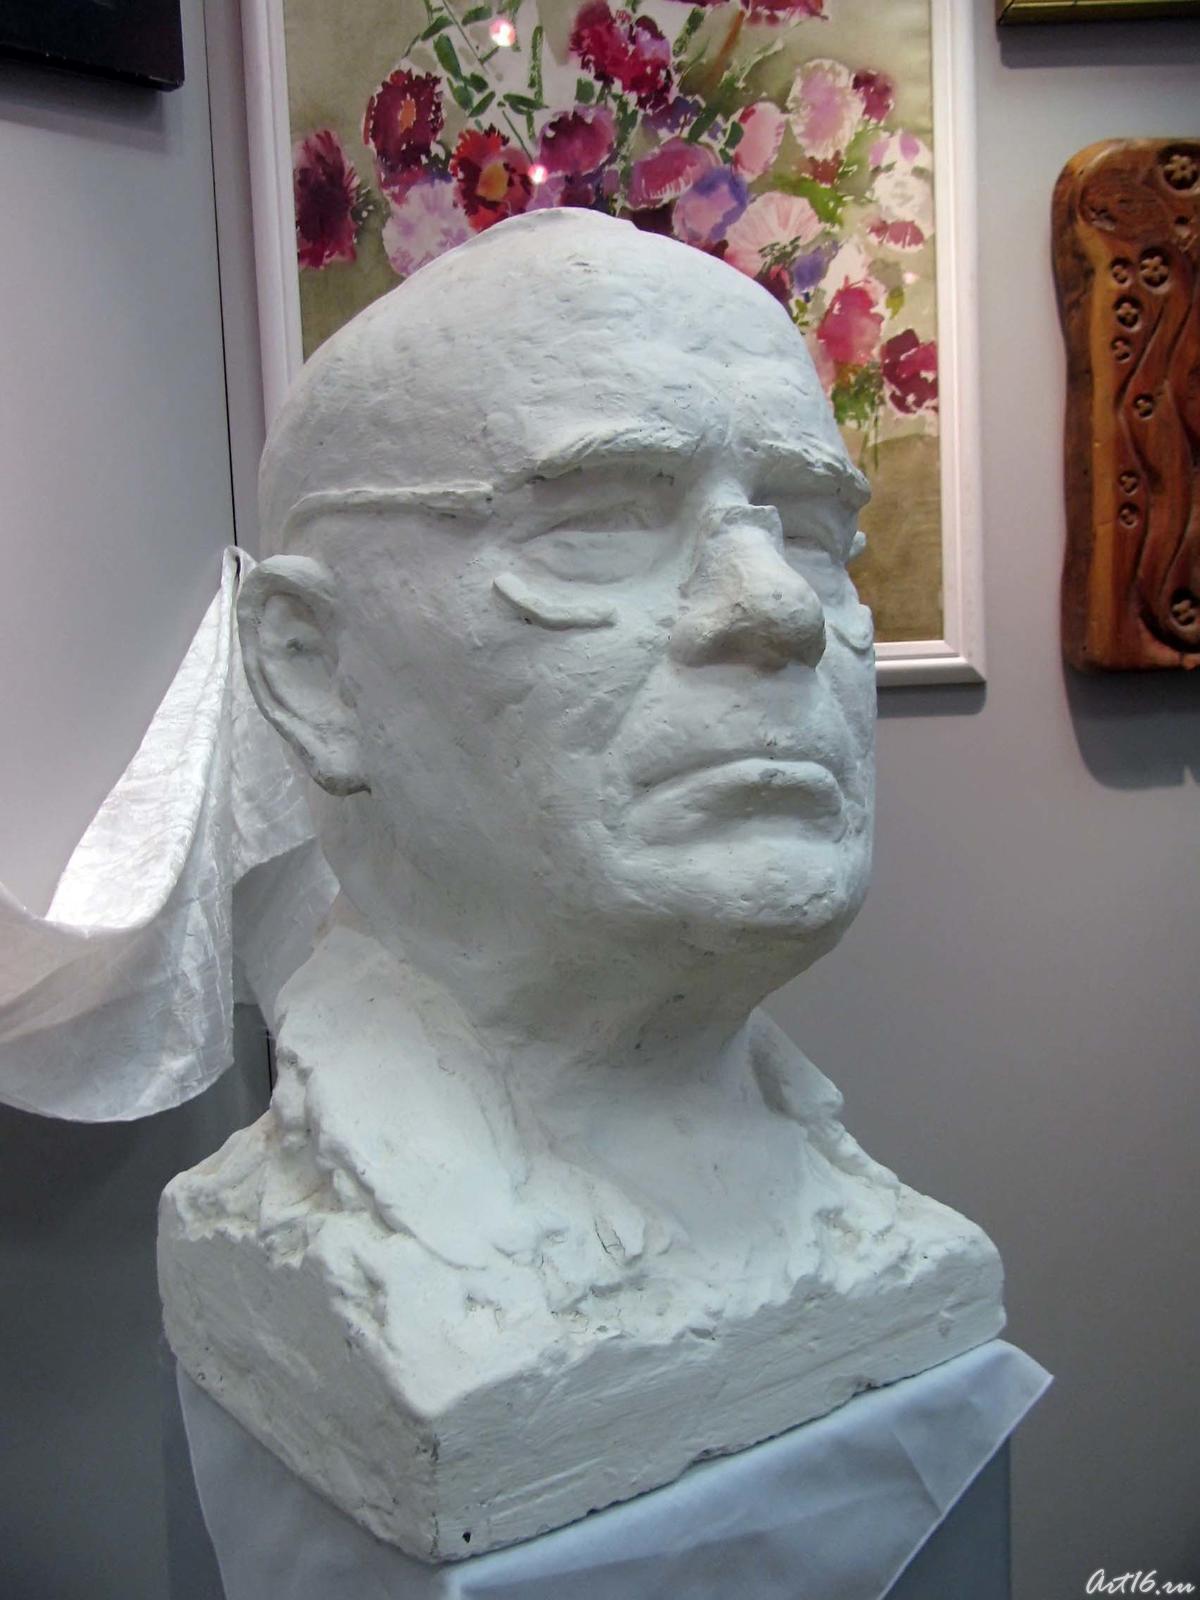 Фото №43531. Скульптура Б. Урманче, салфетка с похорон